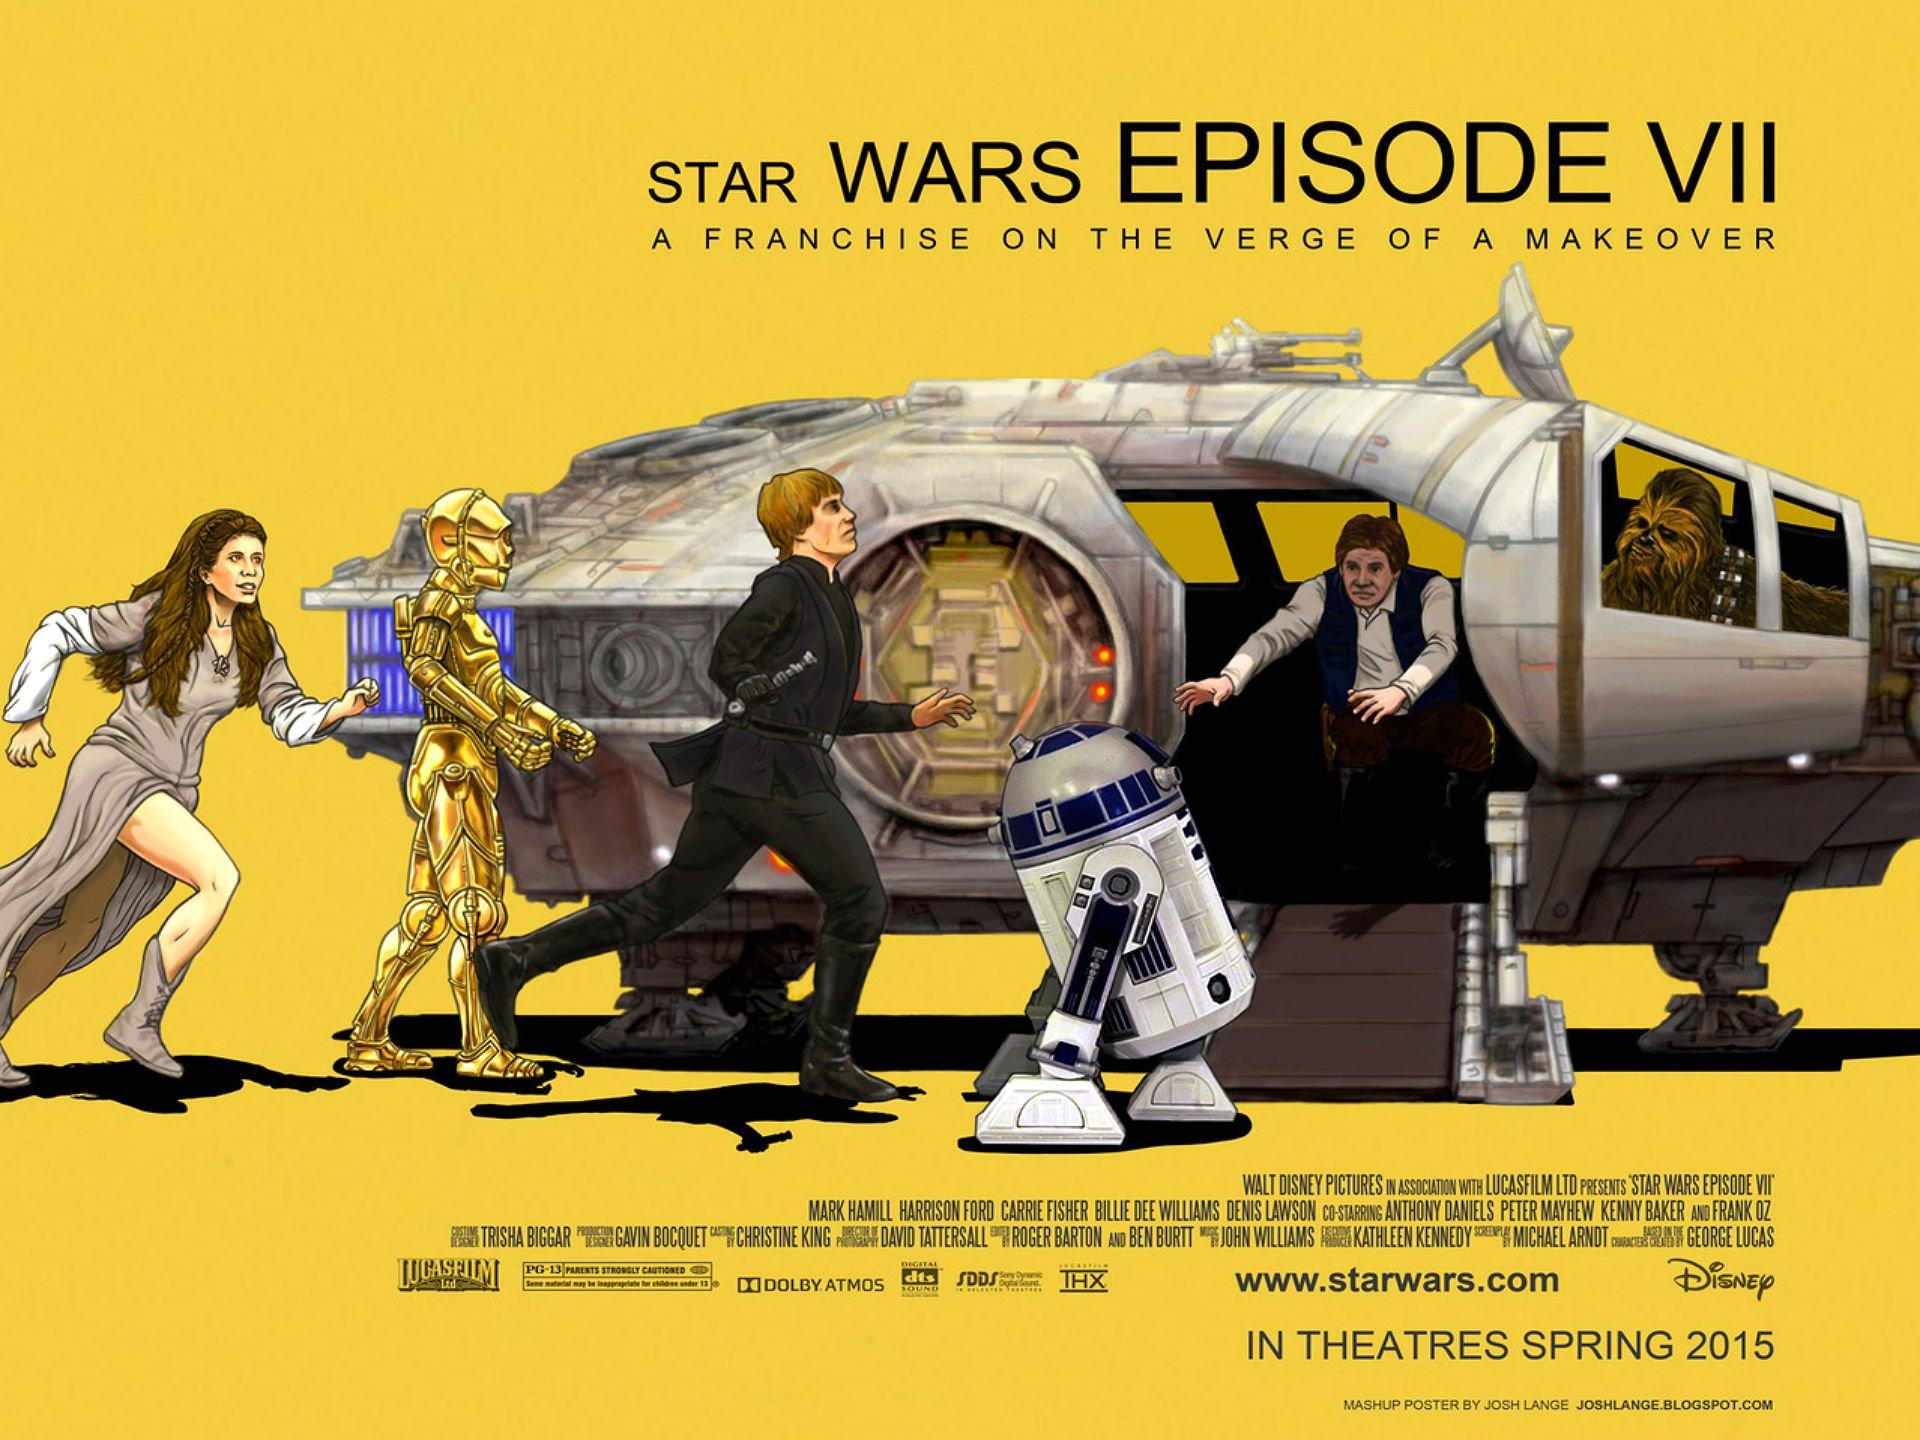 Star Wars Force Awakens Action Adventure Sci Fi Disney Spaceship Wallpaper 1920x1440 533529 Wallpaperup